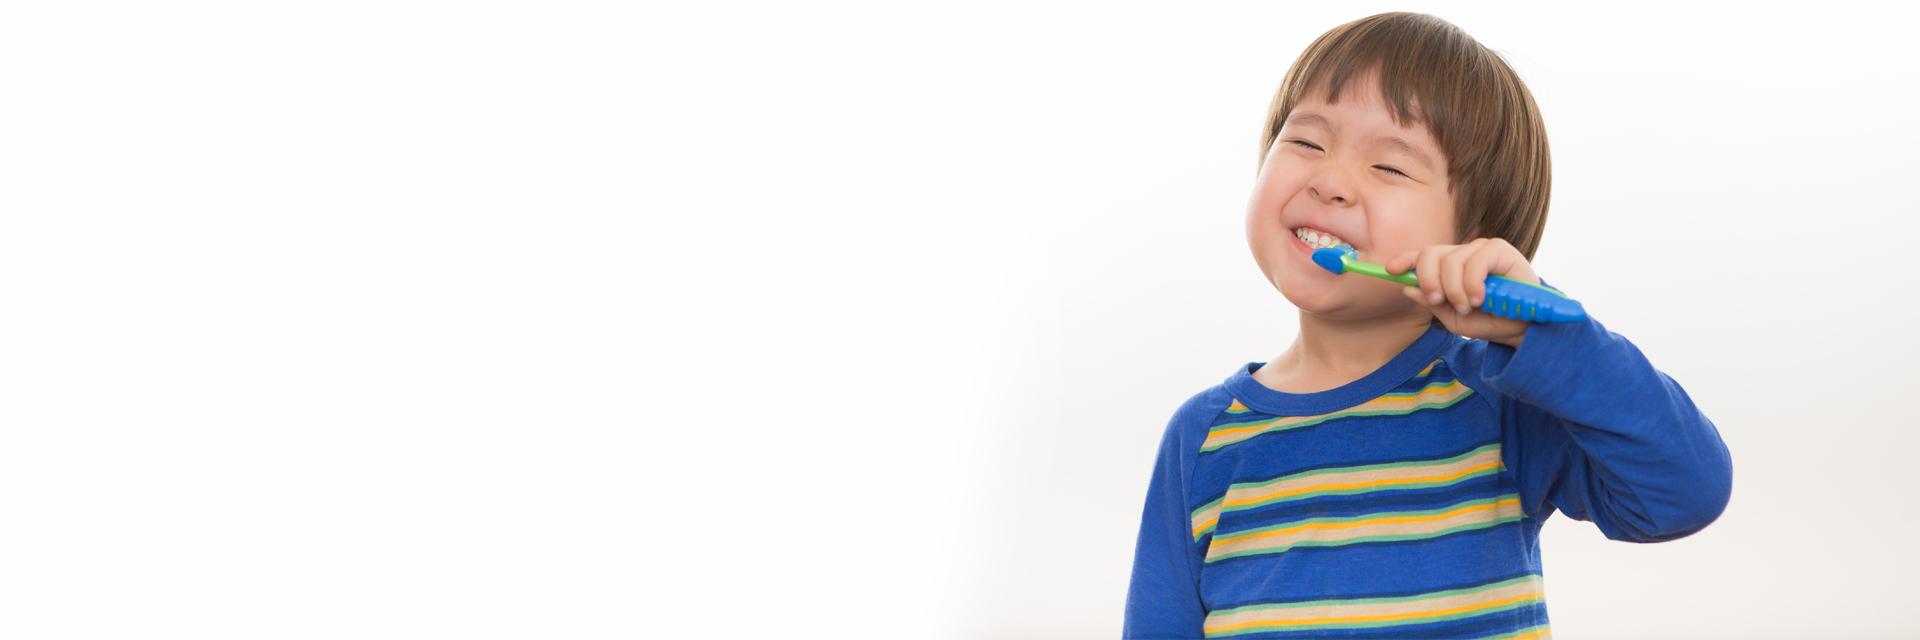 Children's Dental Centre home page webslider 2 | Children's Dental Centre, Sioux Center, IA